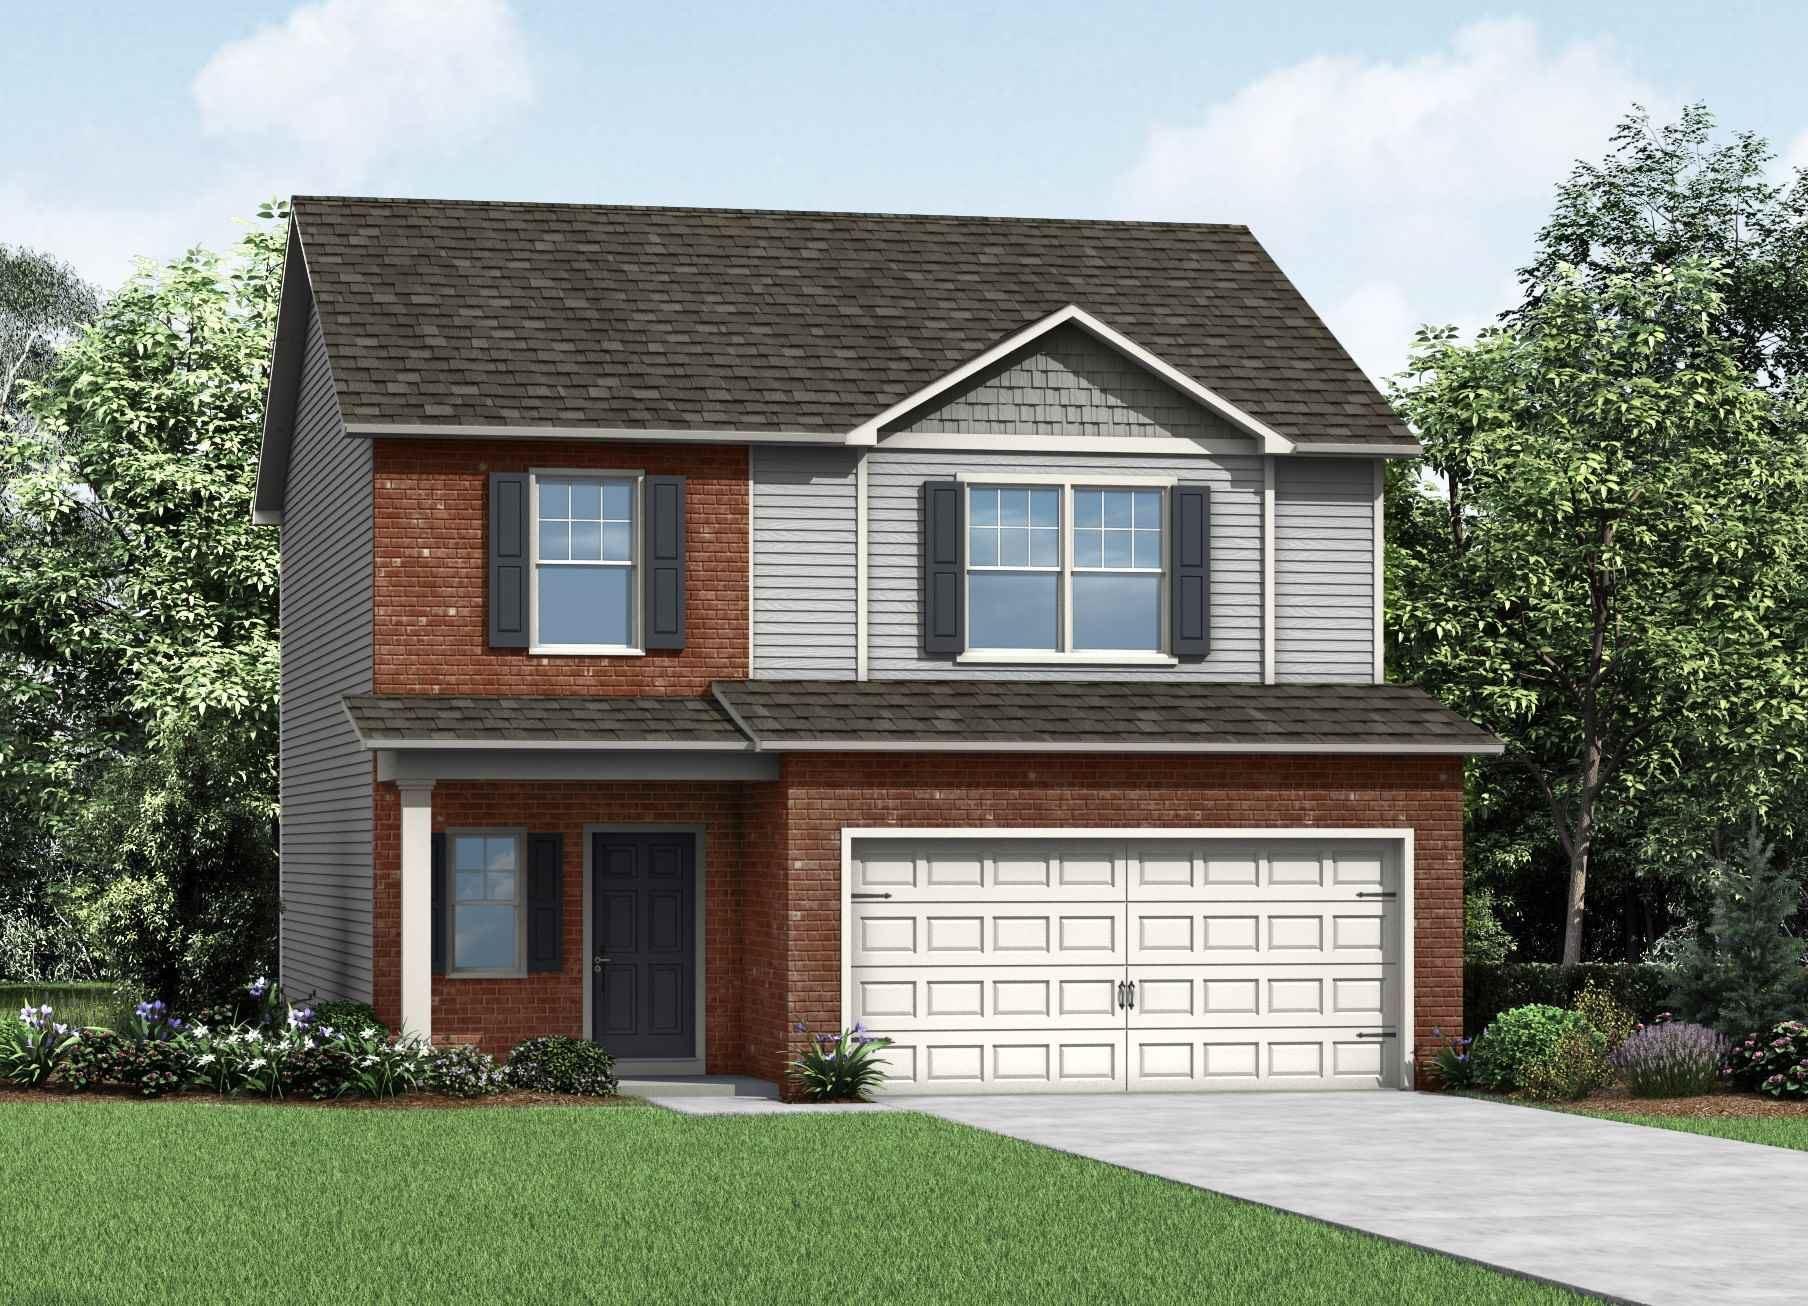 11380 Kilpatrick Ln, Hampton, GA 30228 - MLS#: 8825181